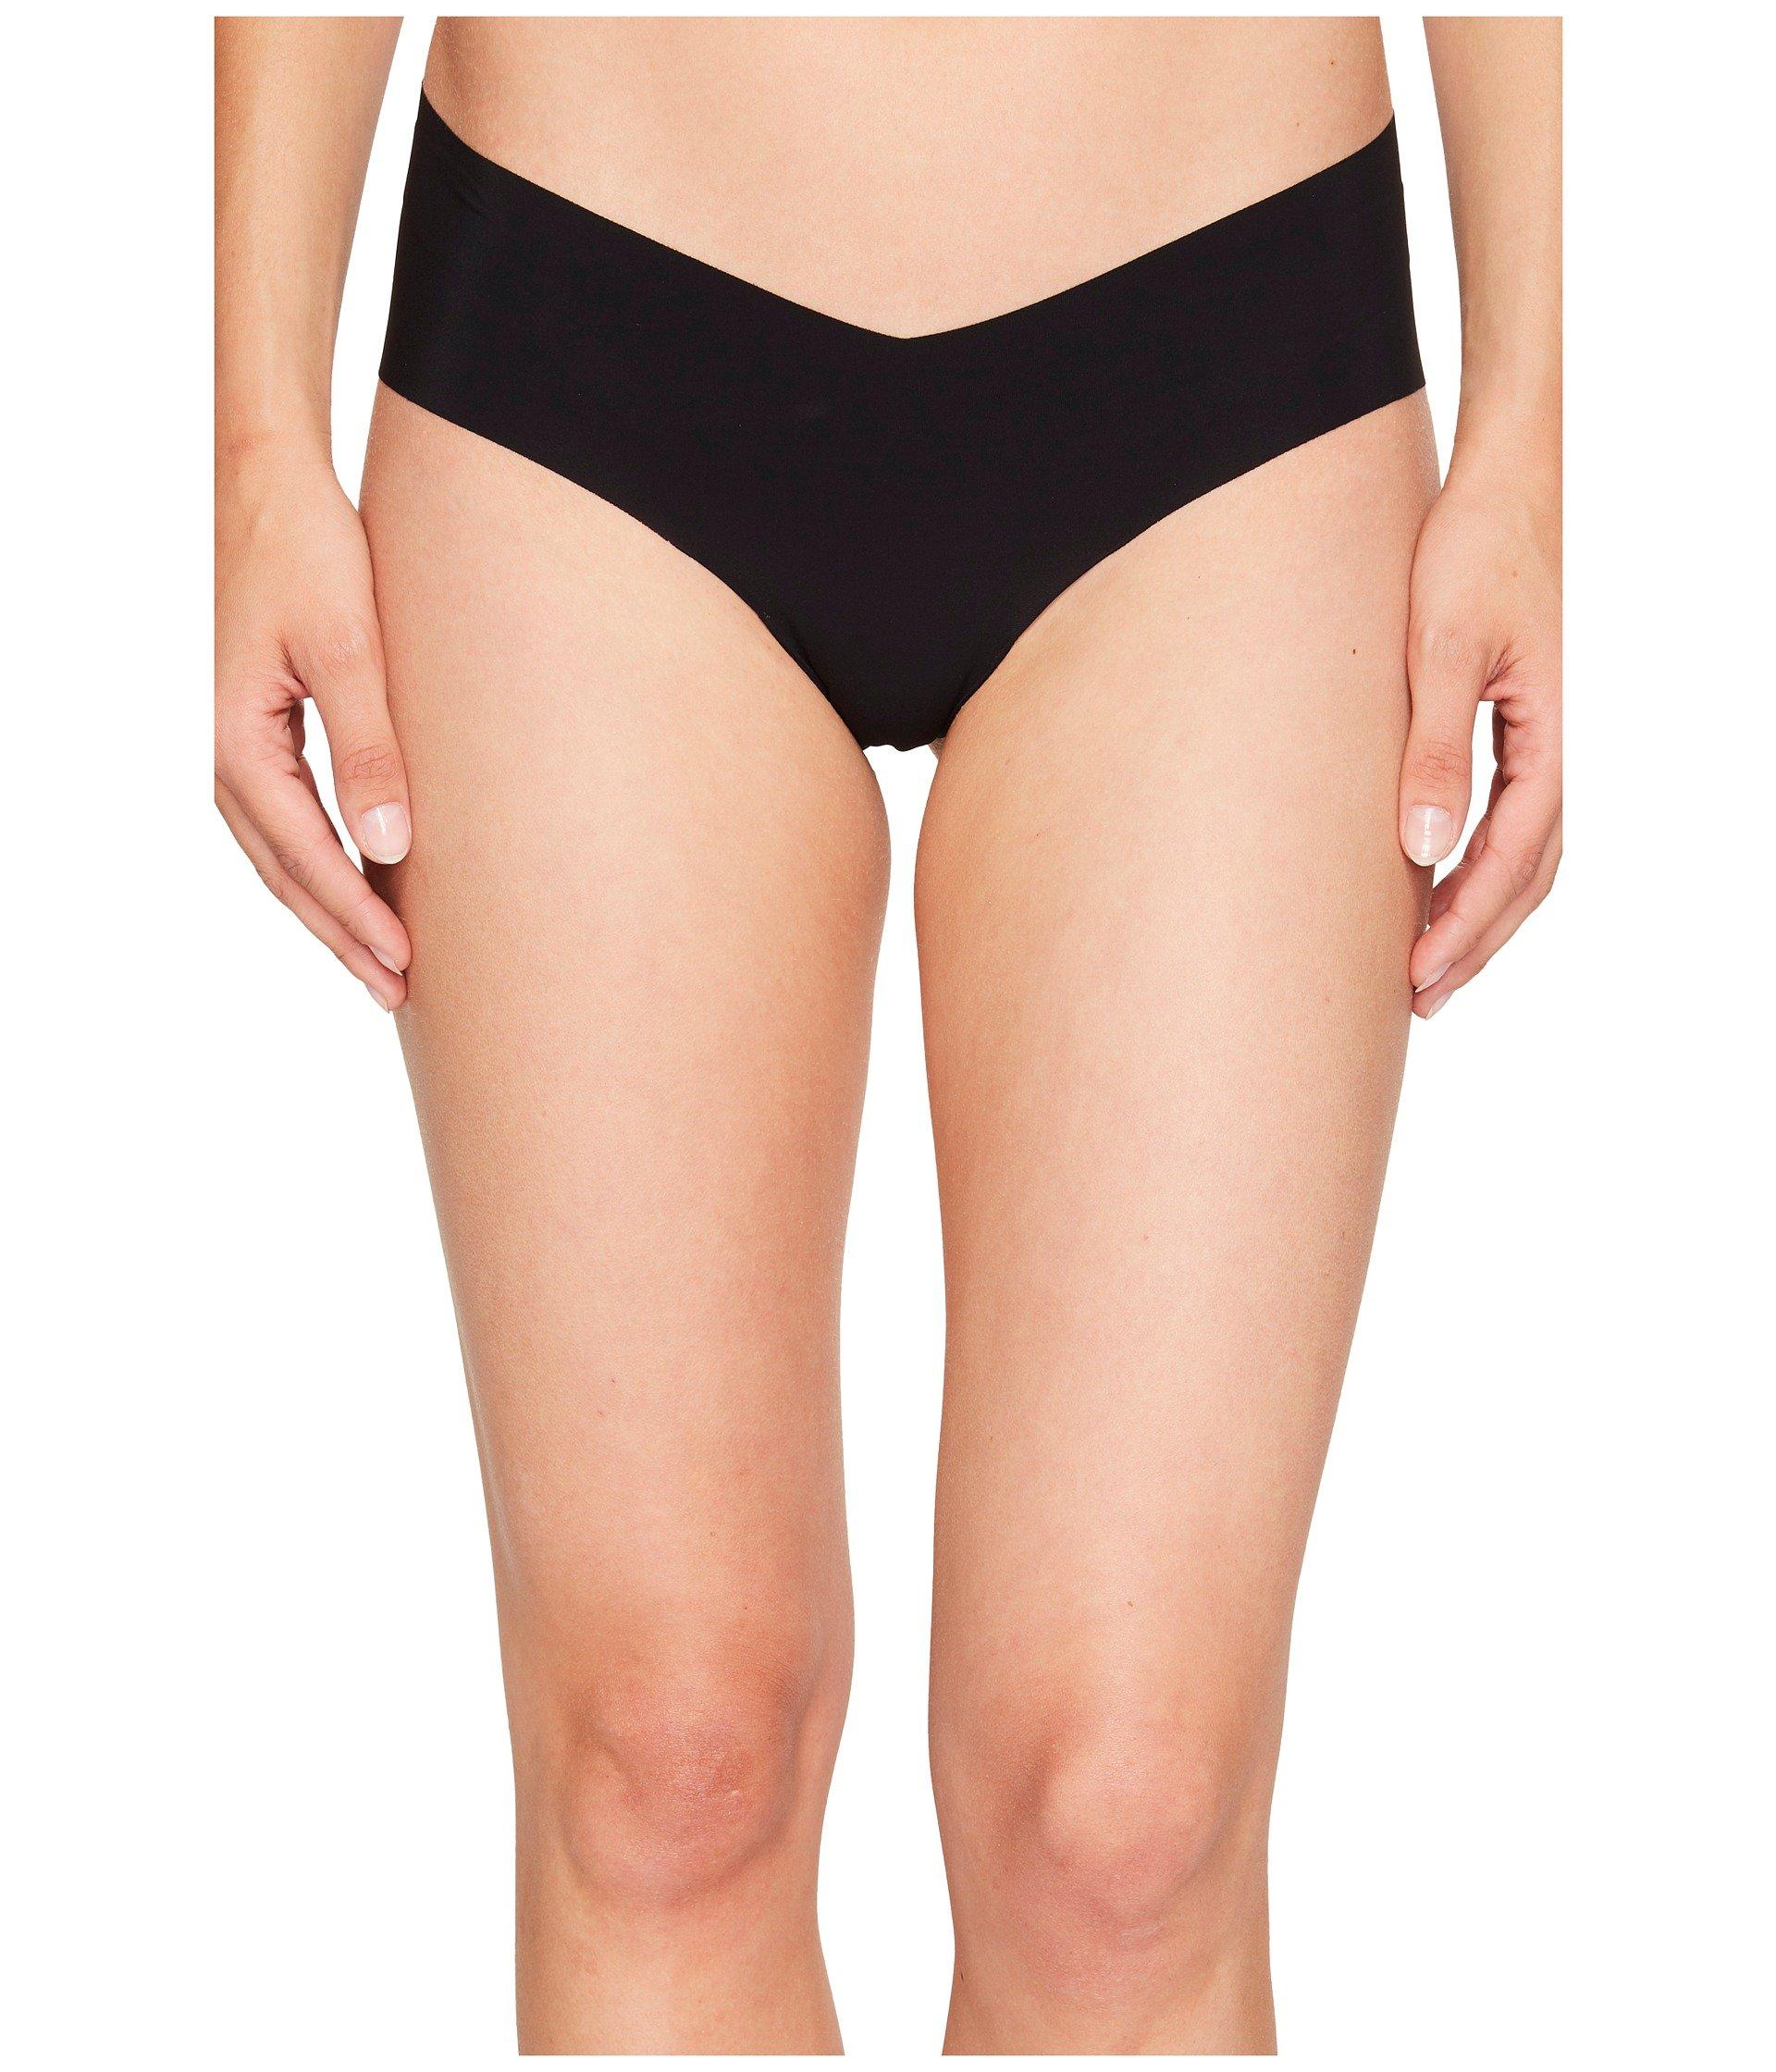 5840ffdc4 Women s Boy Shorts Commando Underwear   Intimates + FREE SHIPPING